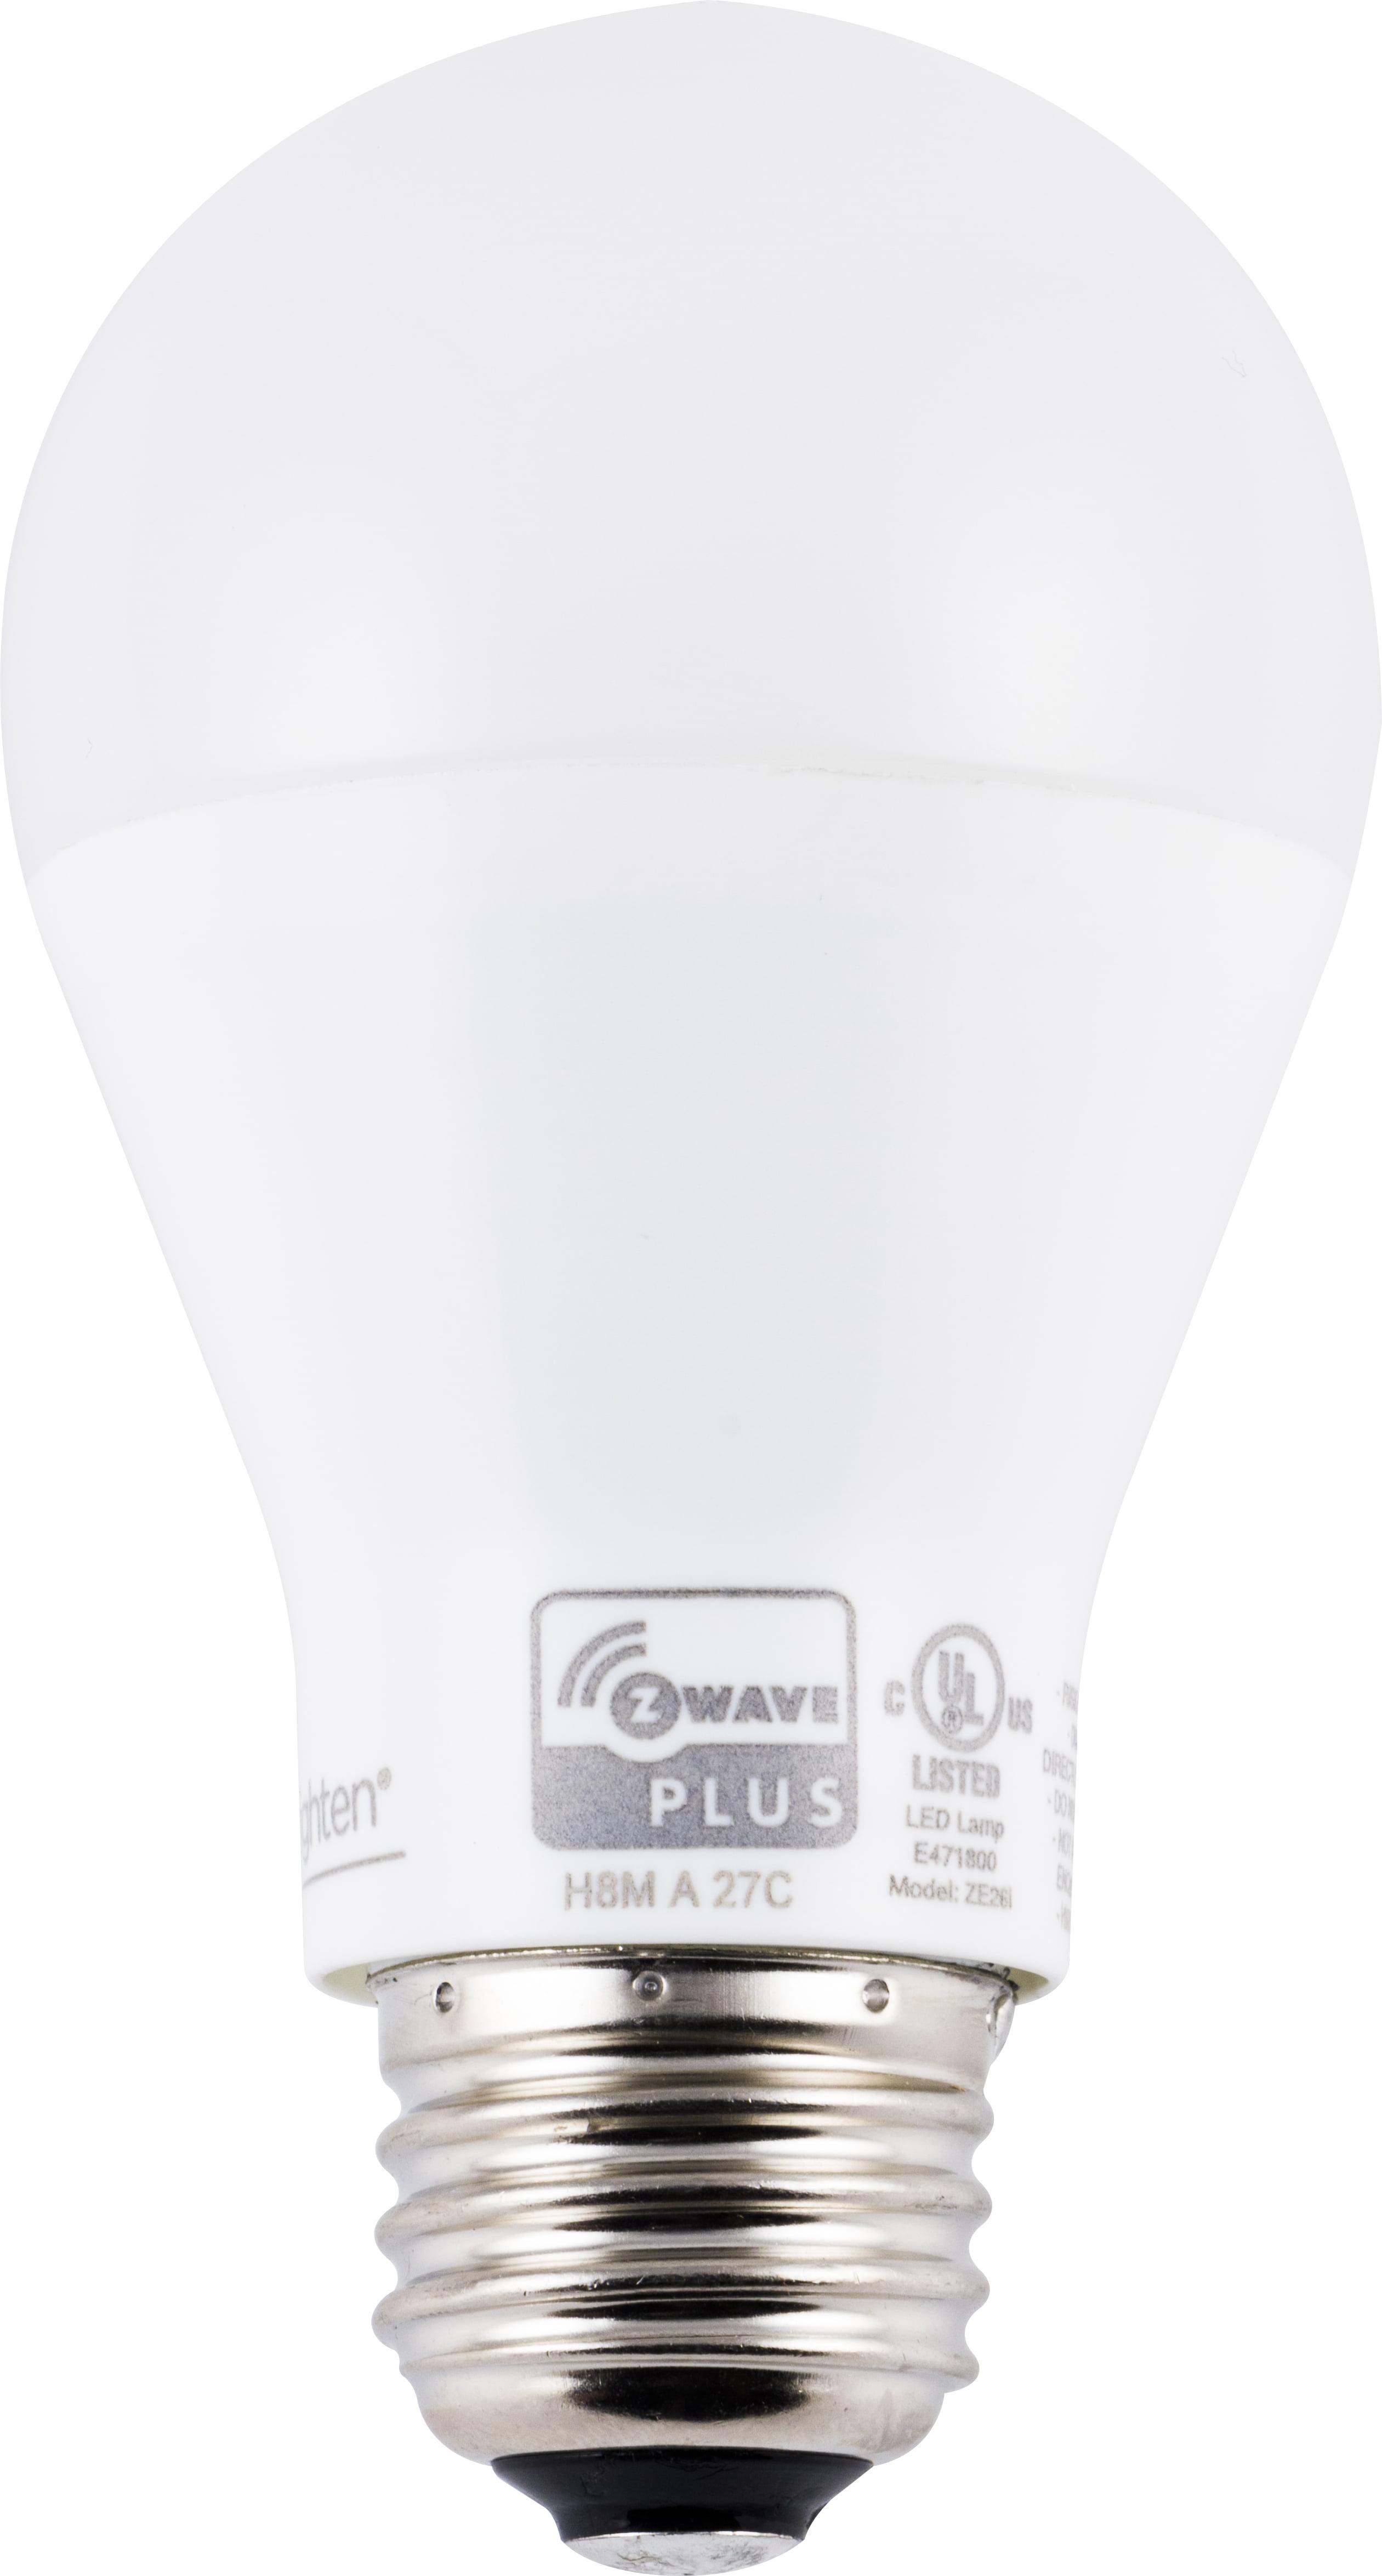 Enbrighten Z Wave Plus Dimmable Led Smart Bulb 60w